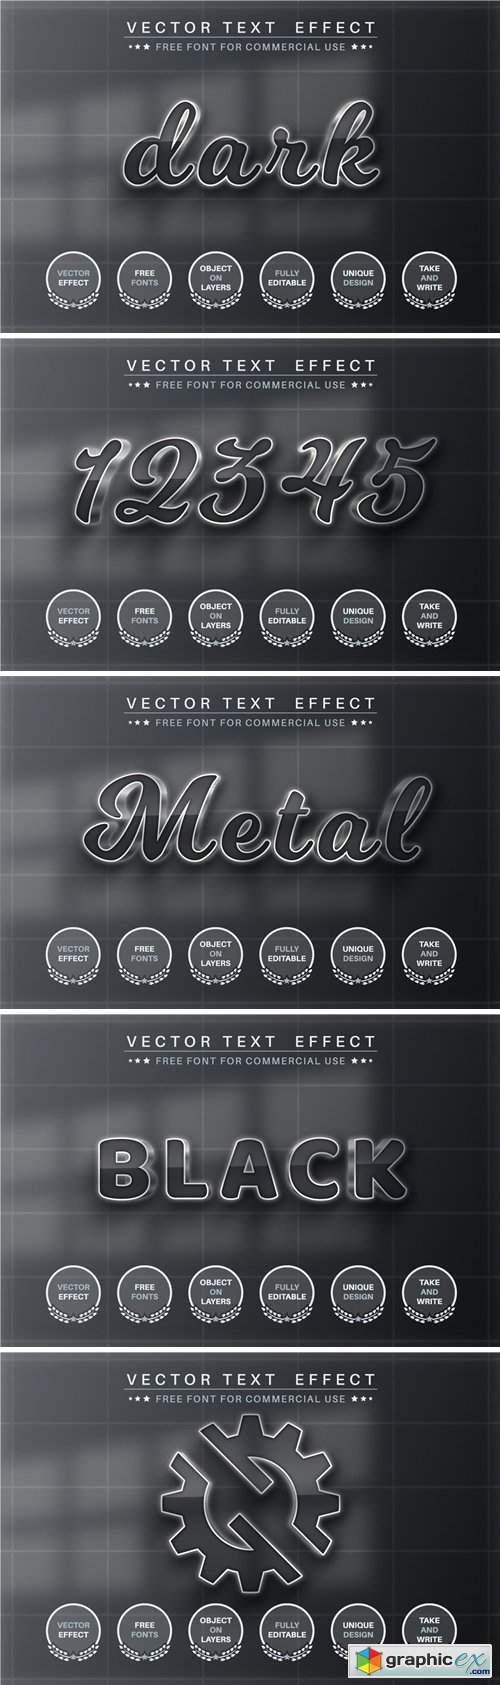 Dark metal - editable text effect, font style